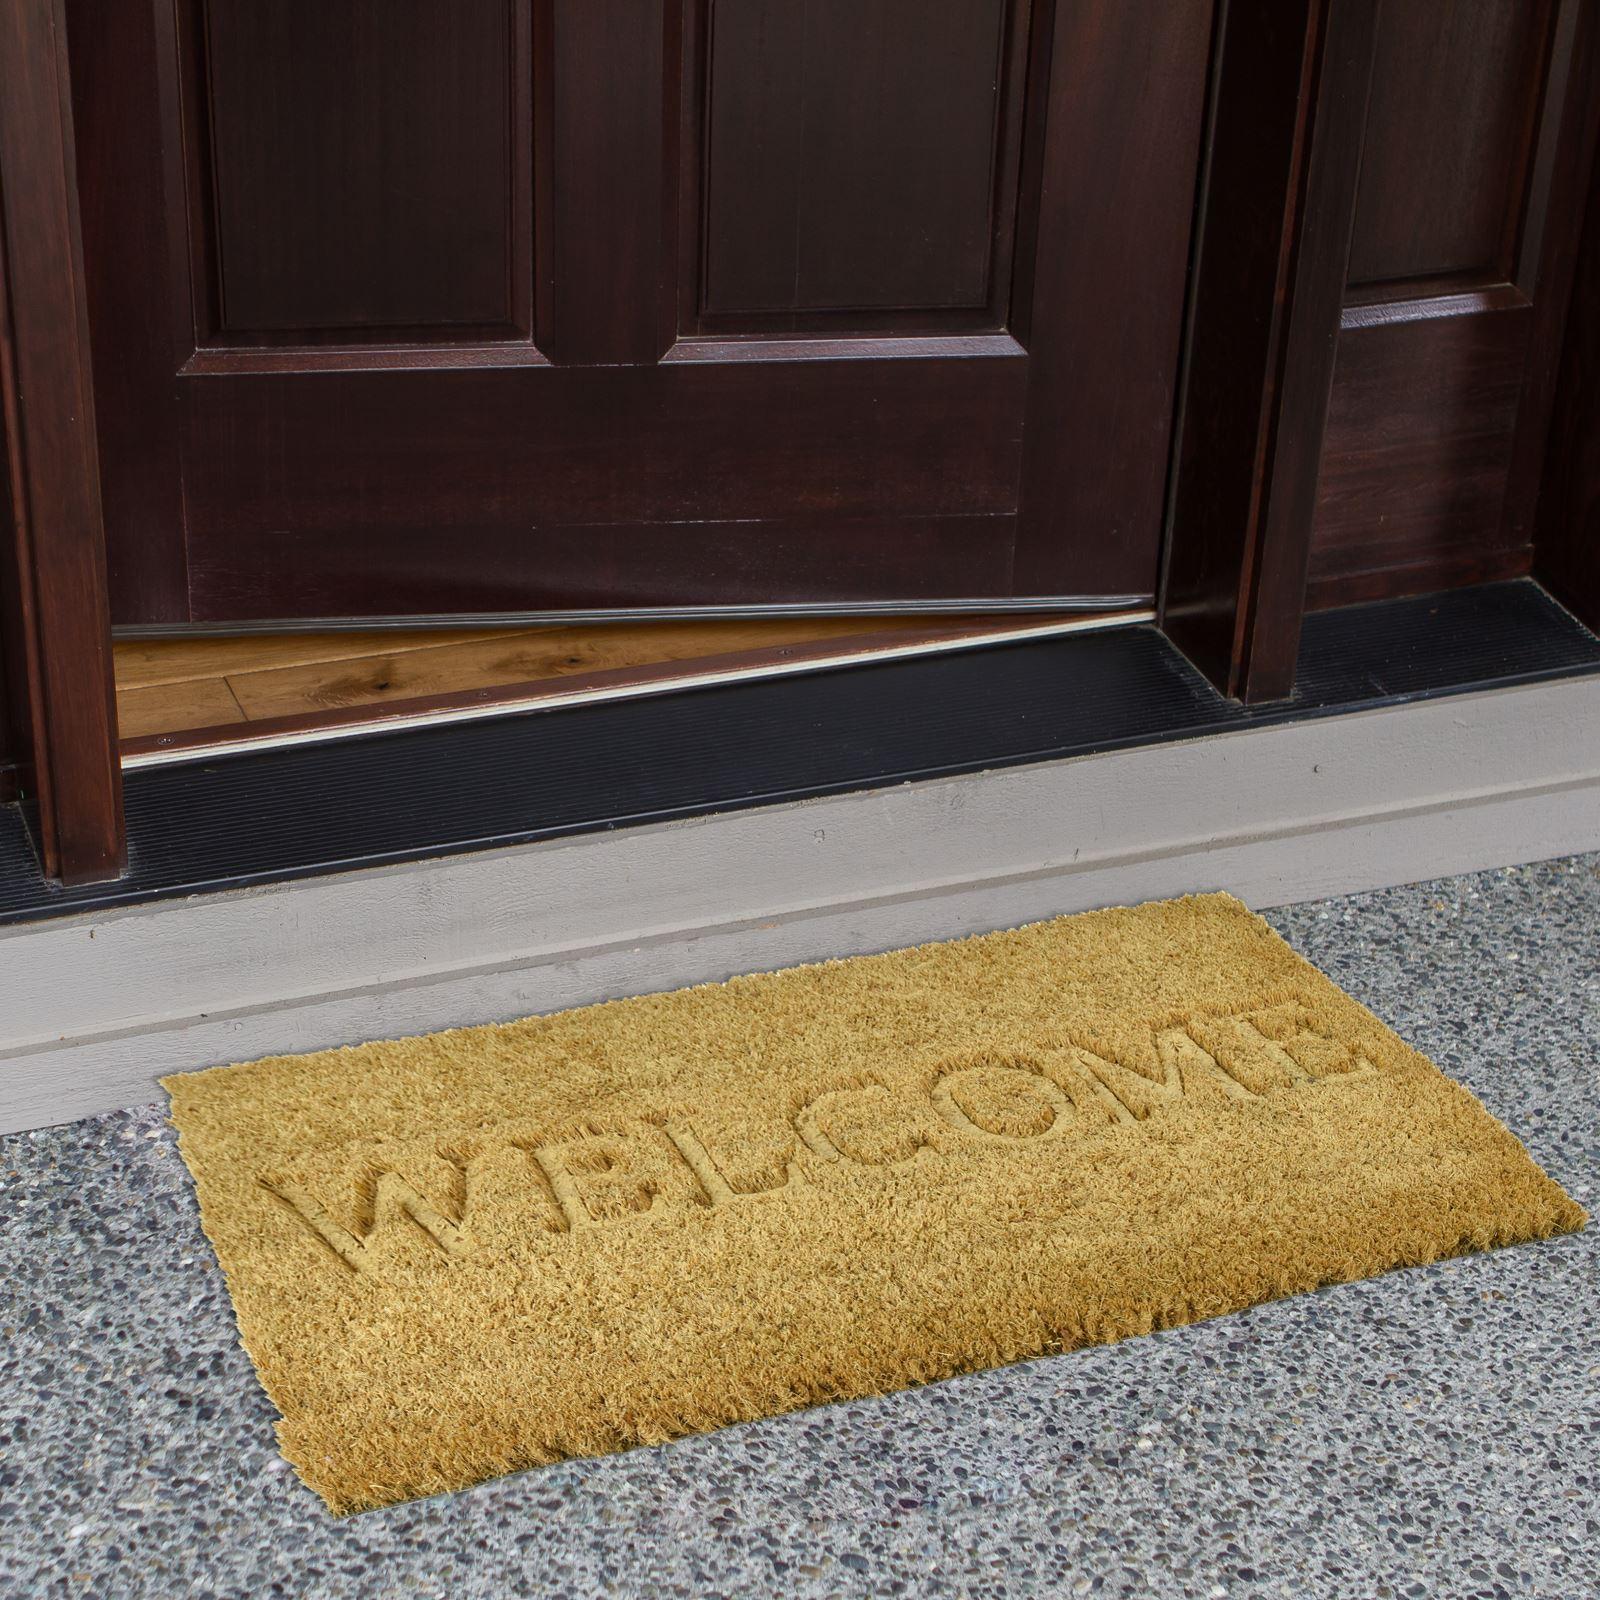 Plain-Non-Slip-Door-Mat-Tough-Natural-Coir-PVC-Back-Welcome-Doormat-40-x-60cm miniatura 41